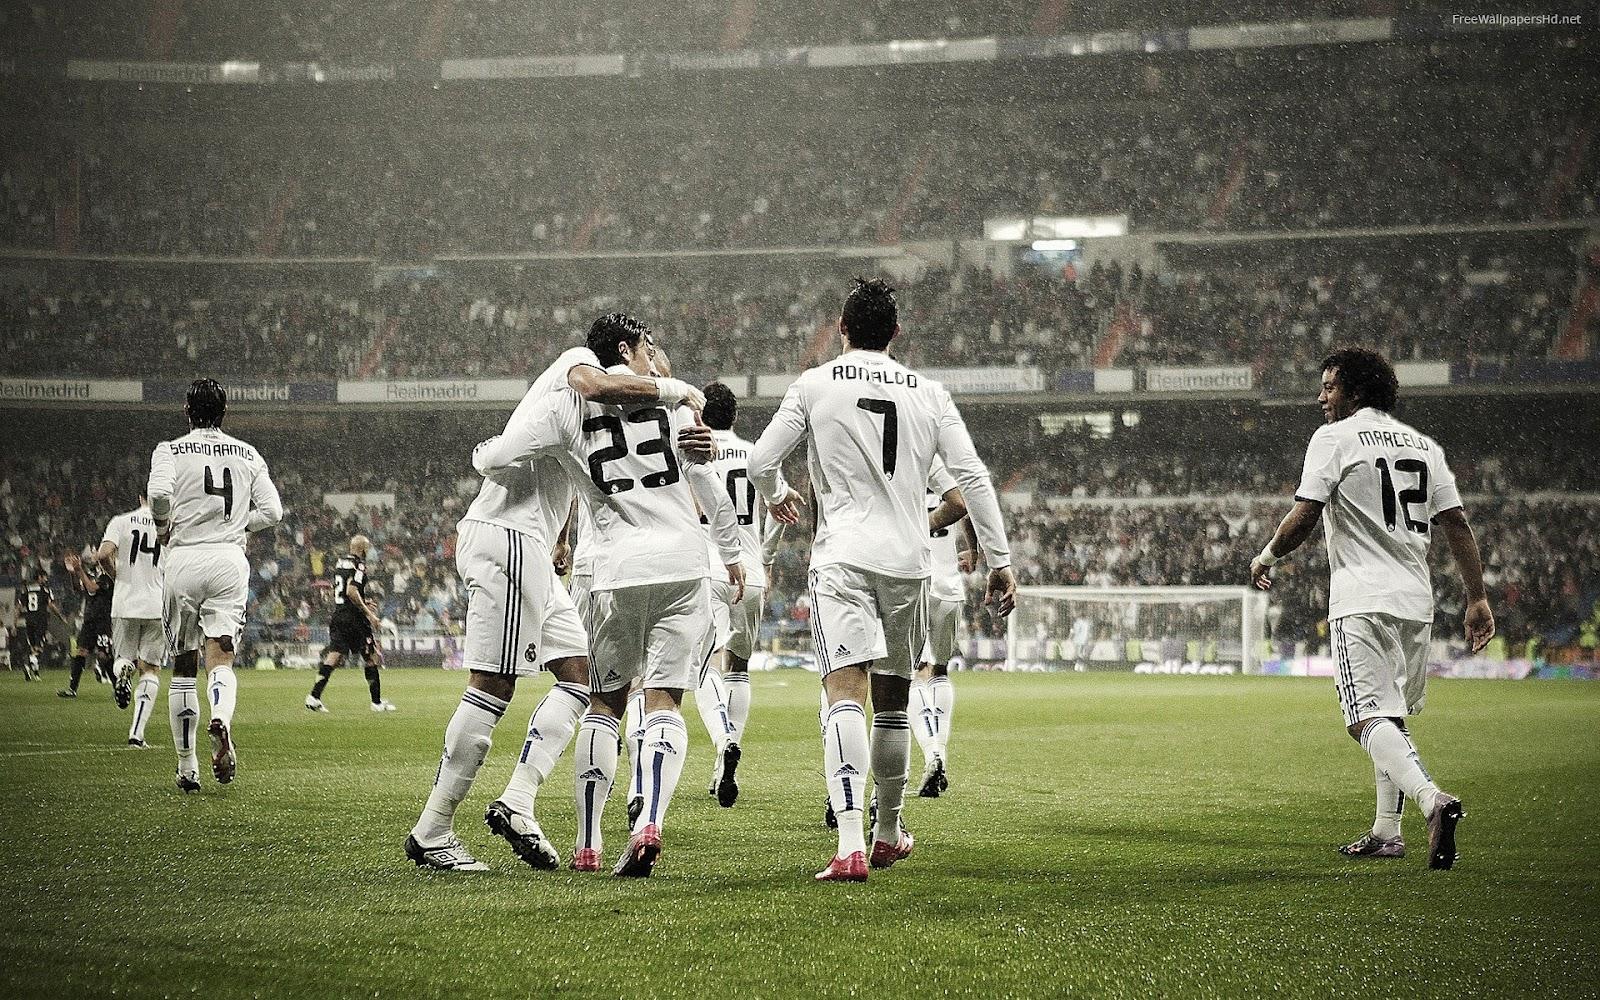 http://3.bp.blogspot.com/-ZI8wHV_gFPo/UFT8sthy8WI/AAAAAAAACCE/VH4ArXEn2mw/s1600/Real+Madrid+Soccer+Wallpaper+2012-2013+02.jpg